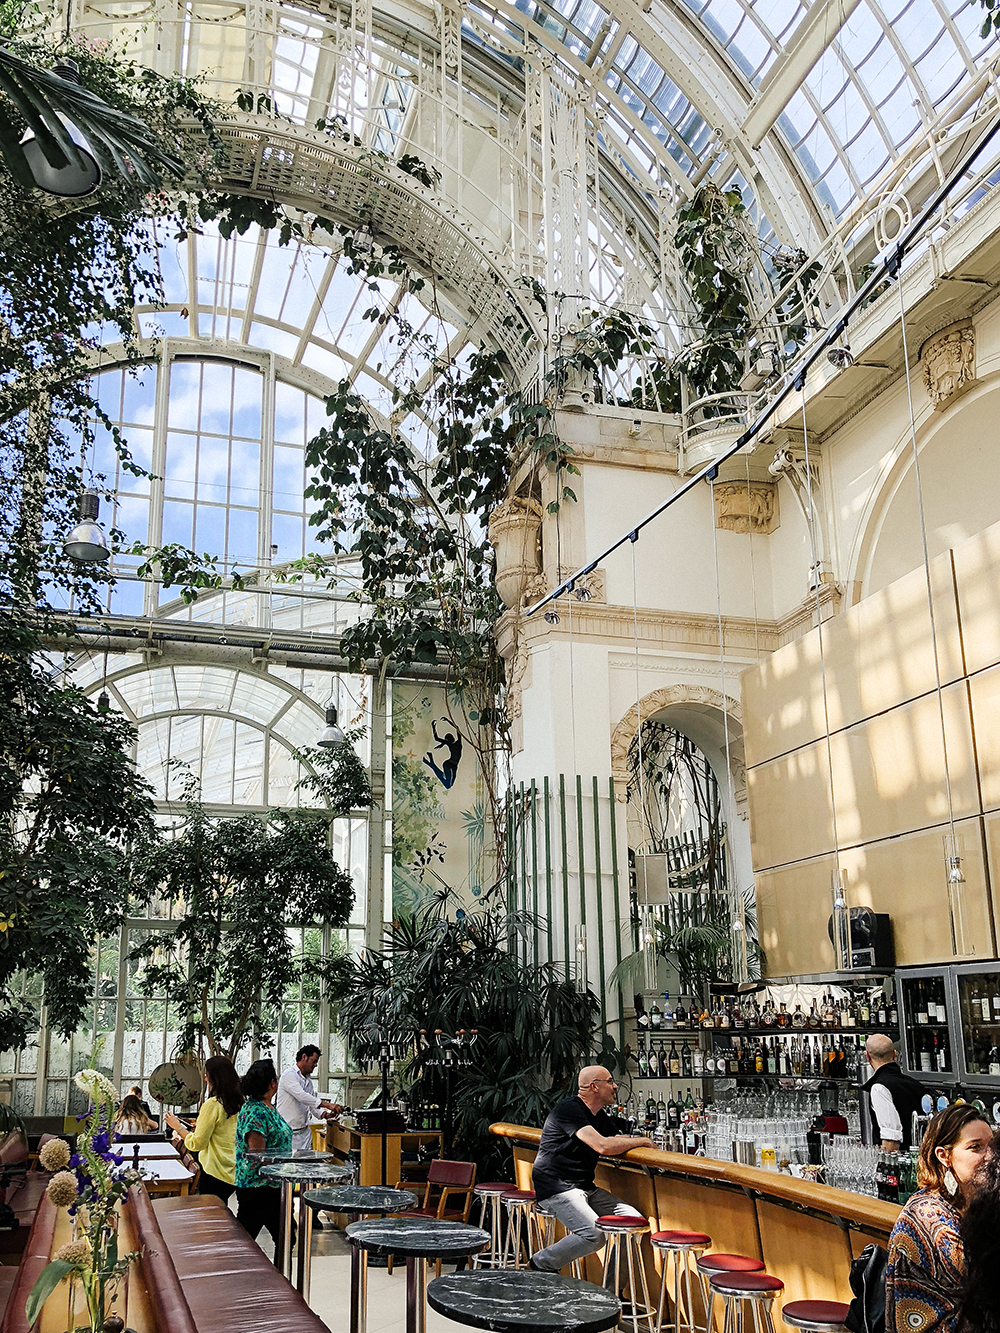 Vienna Palmenhaus interior Stylesnooperdan.jpg